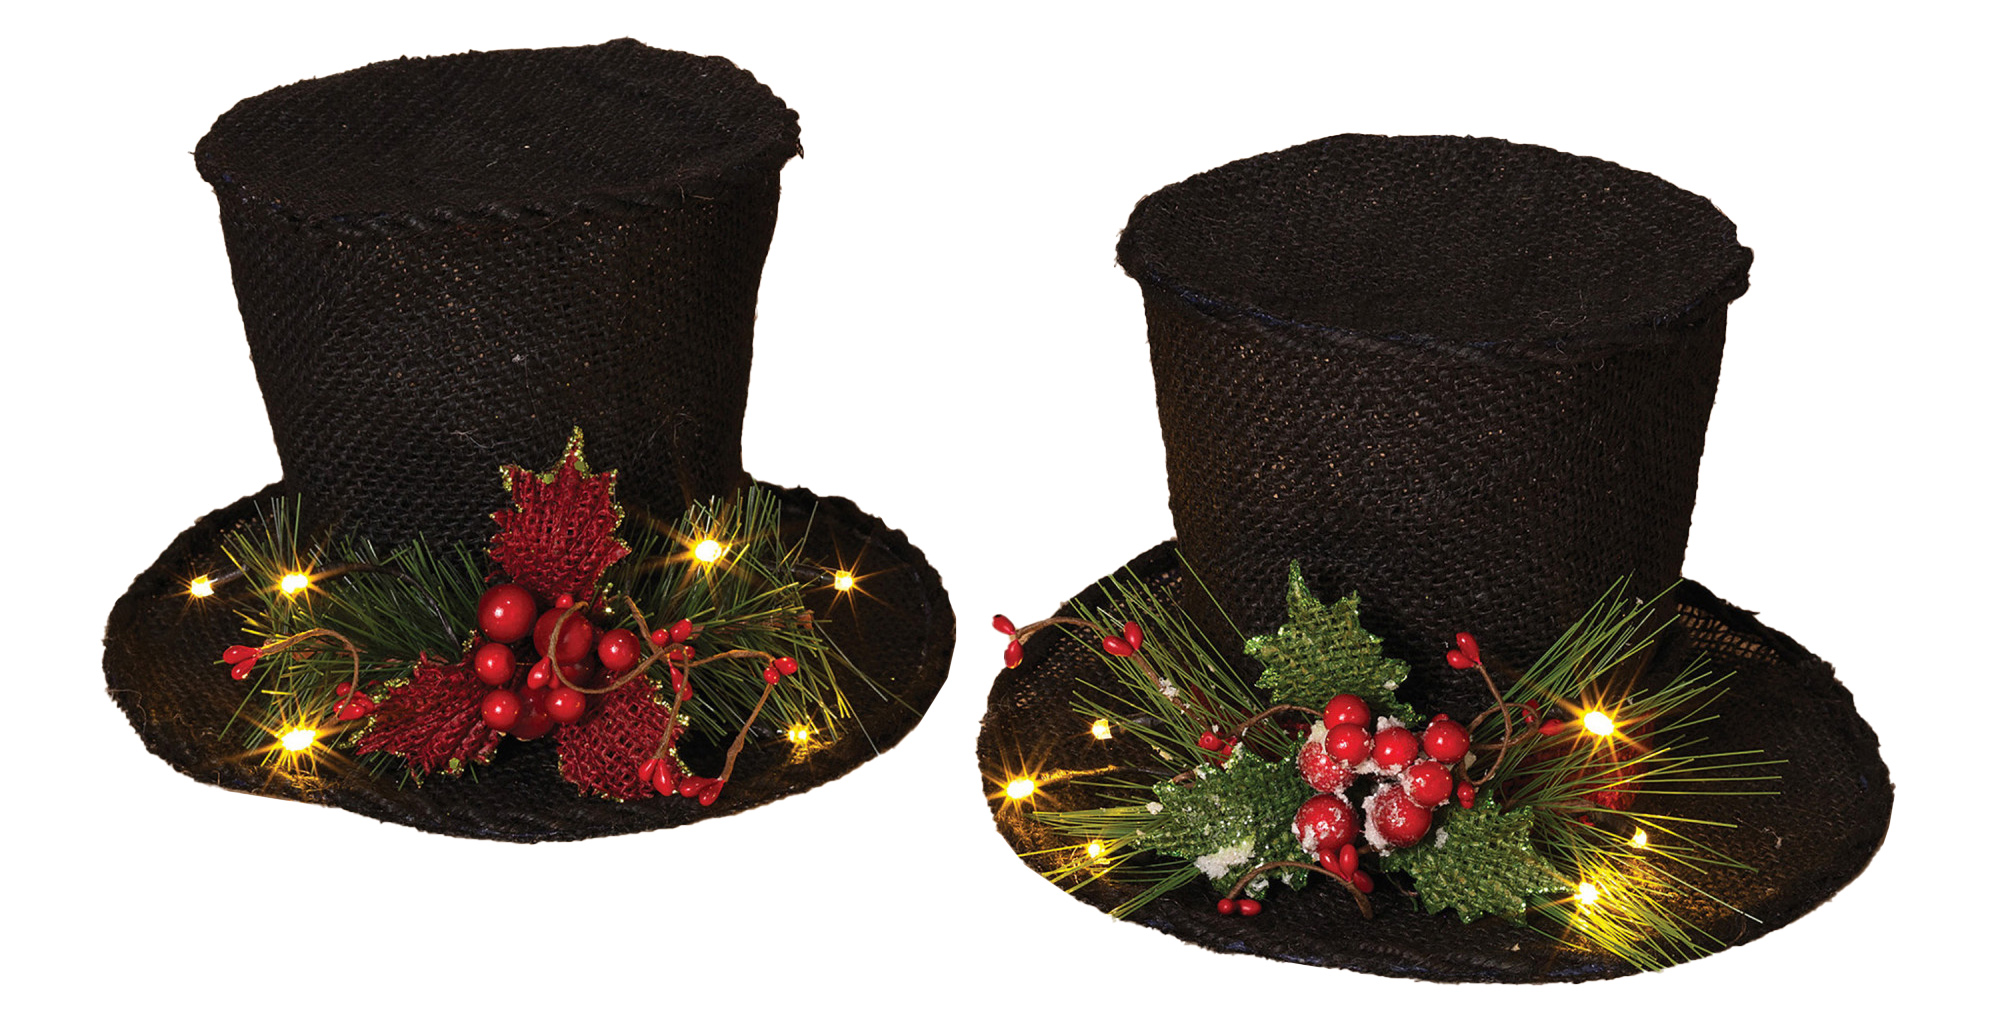 Details about Lighted Black Burlap Snowman Caroler Top Hat Set Christmas Holly Berries Decor